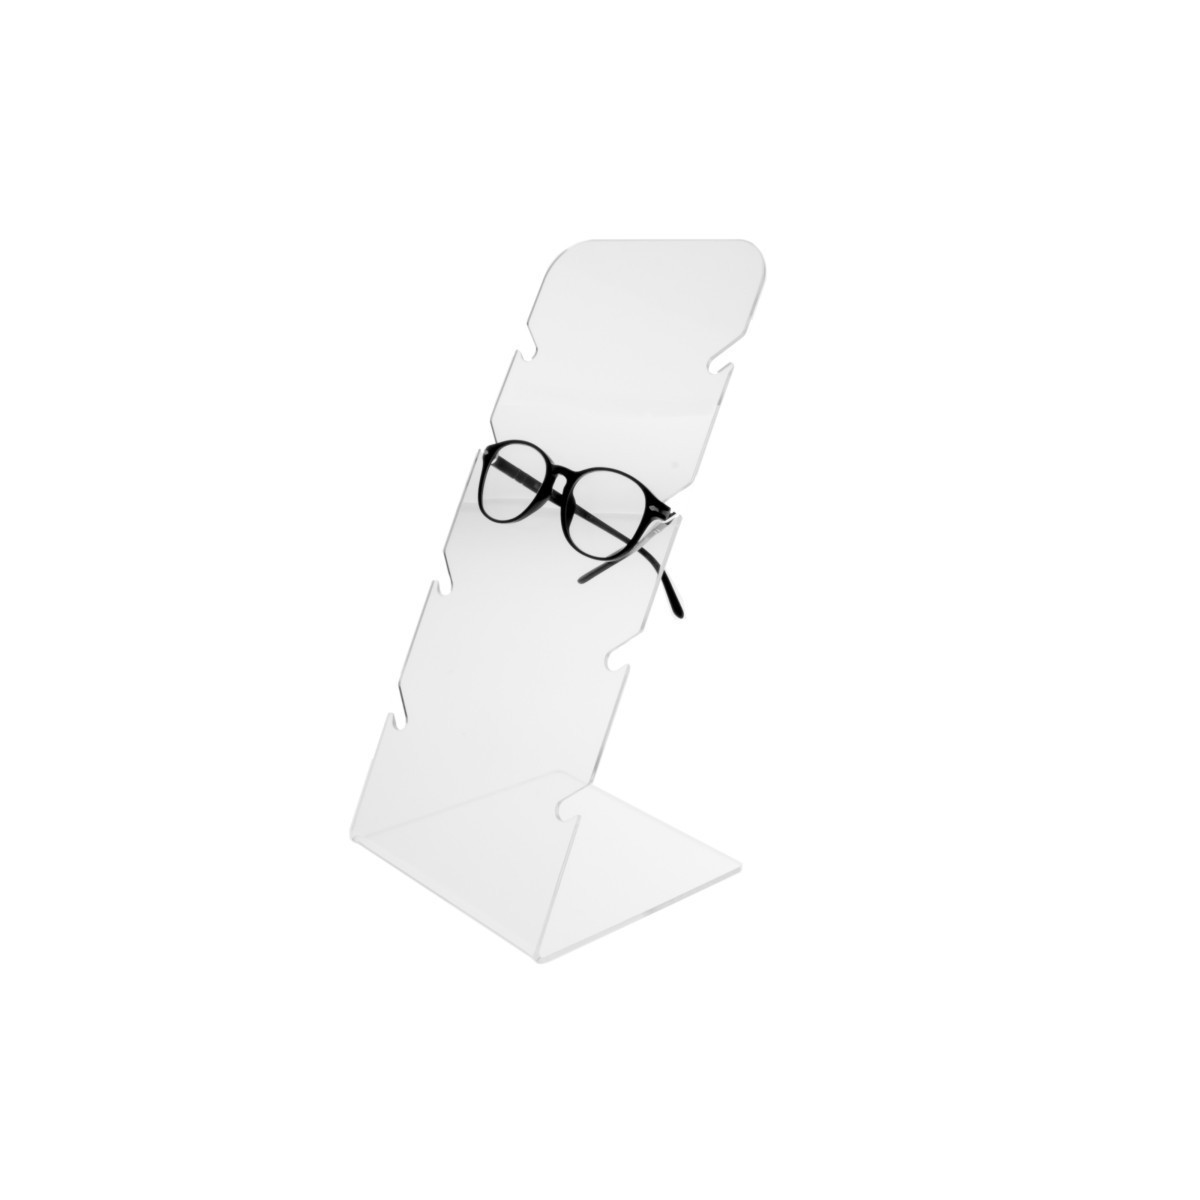 E-180 - Portaocchiali in plexiglass trasparente